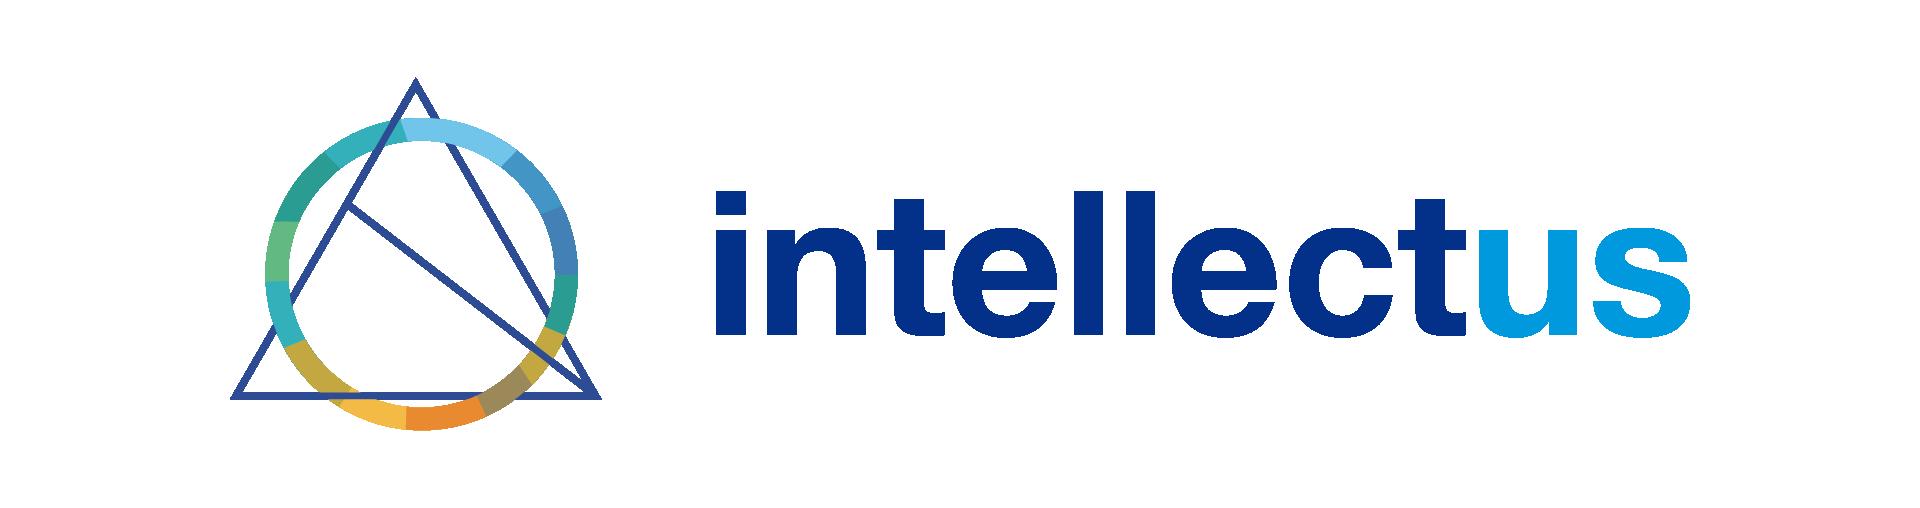 Intellectus Logo